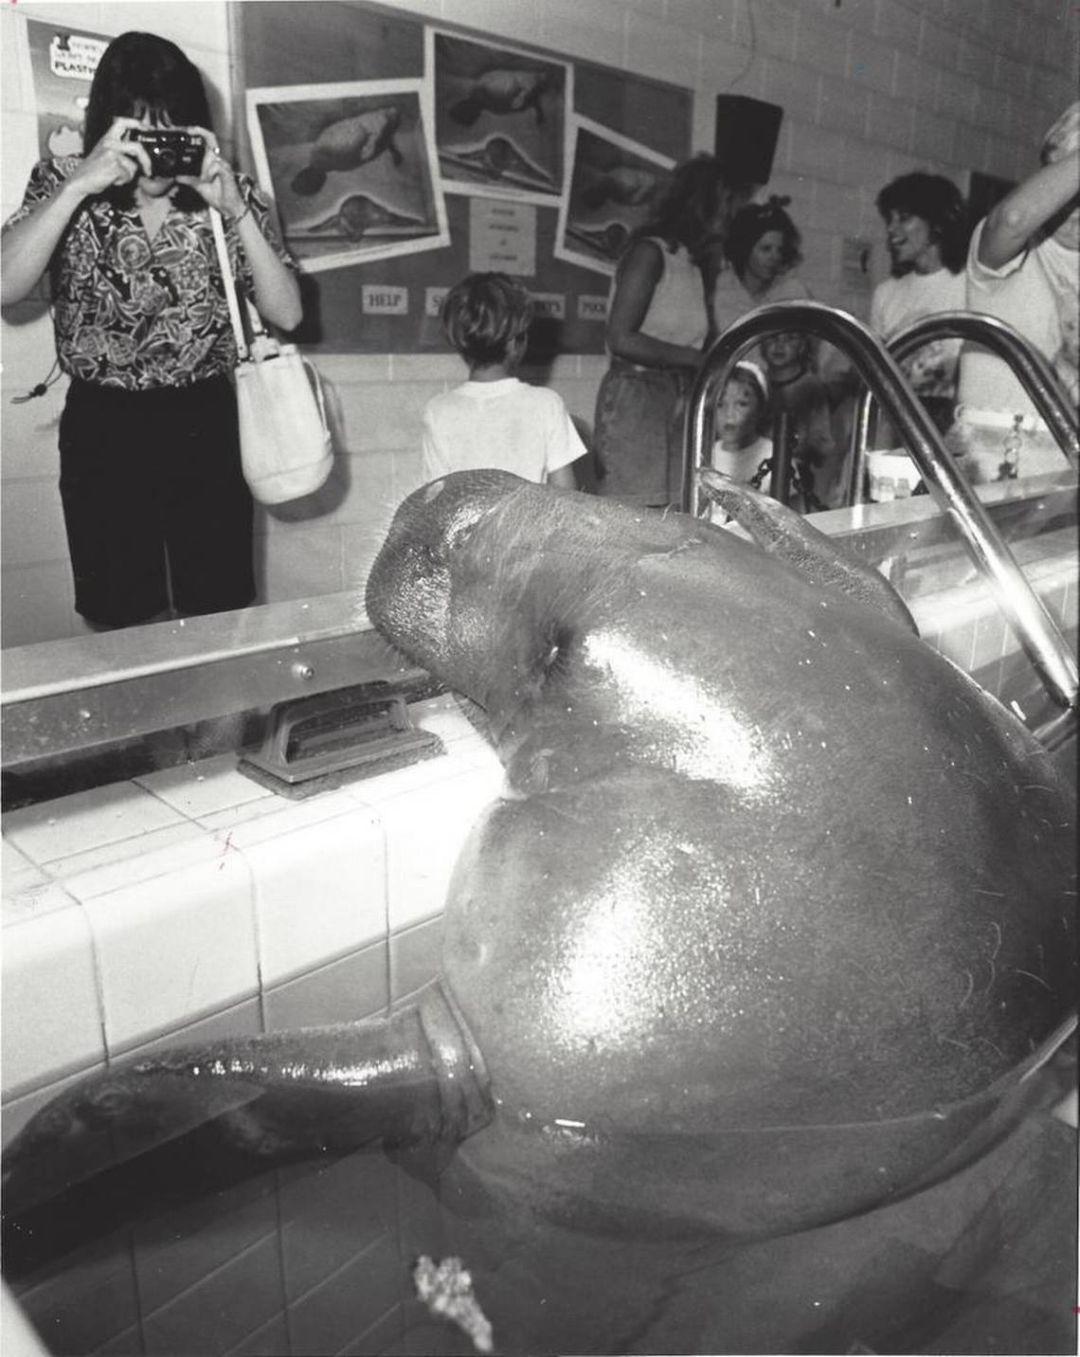 Snooty 1992 tw39gq